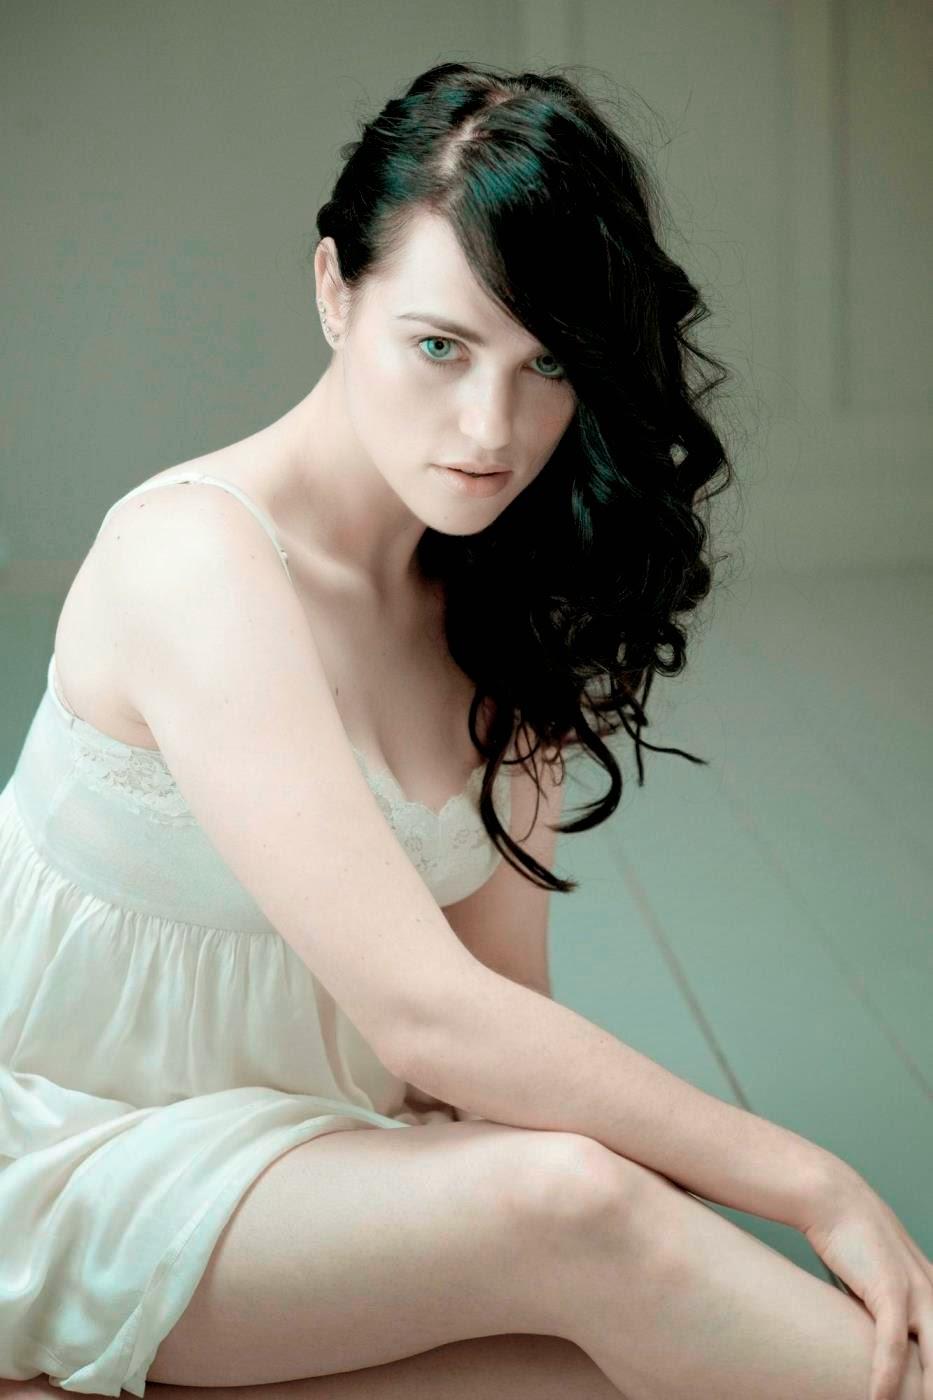 Katie Mcgrath Hot Pictures Galleries - SHINER PHOTOS